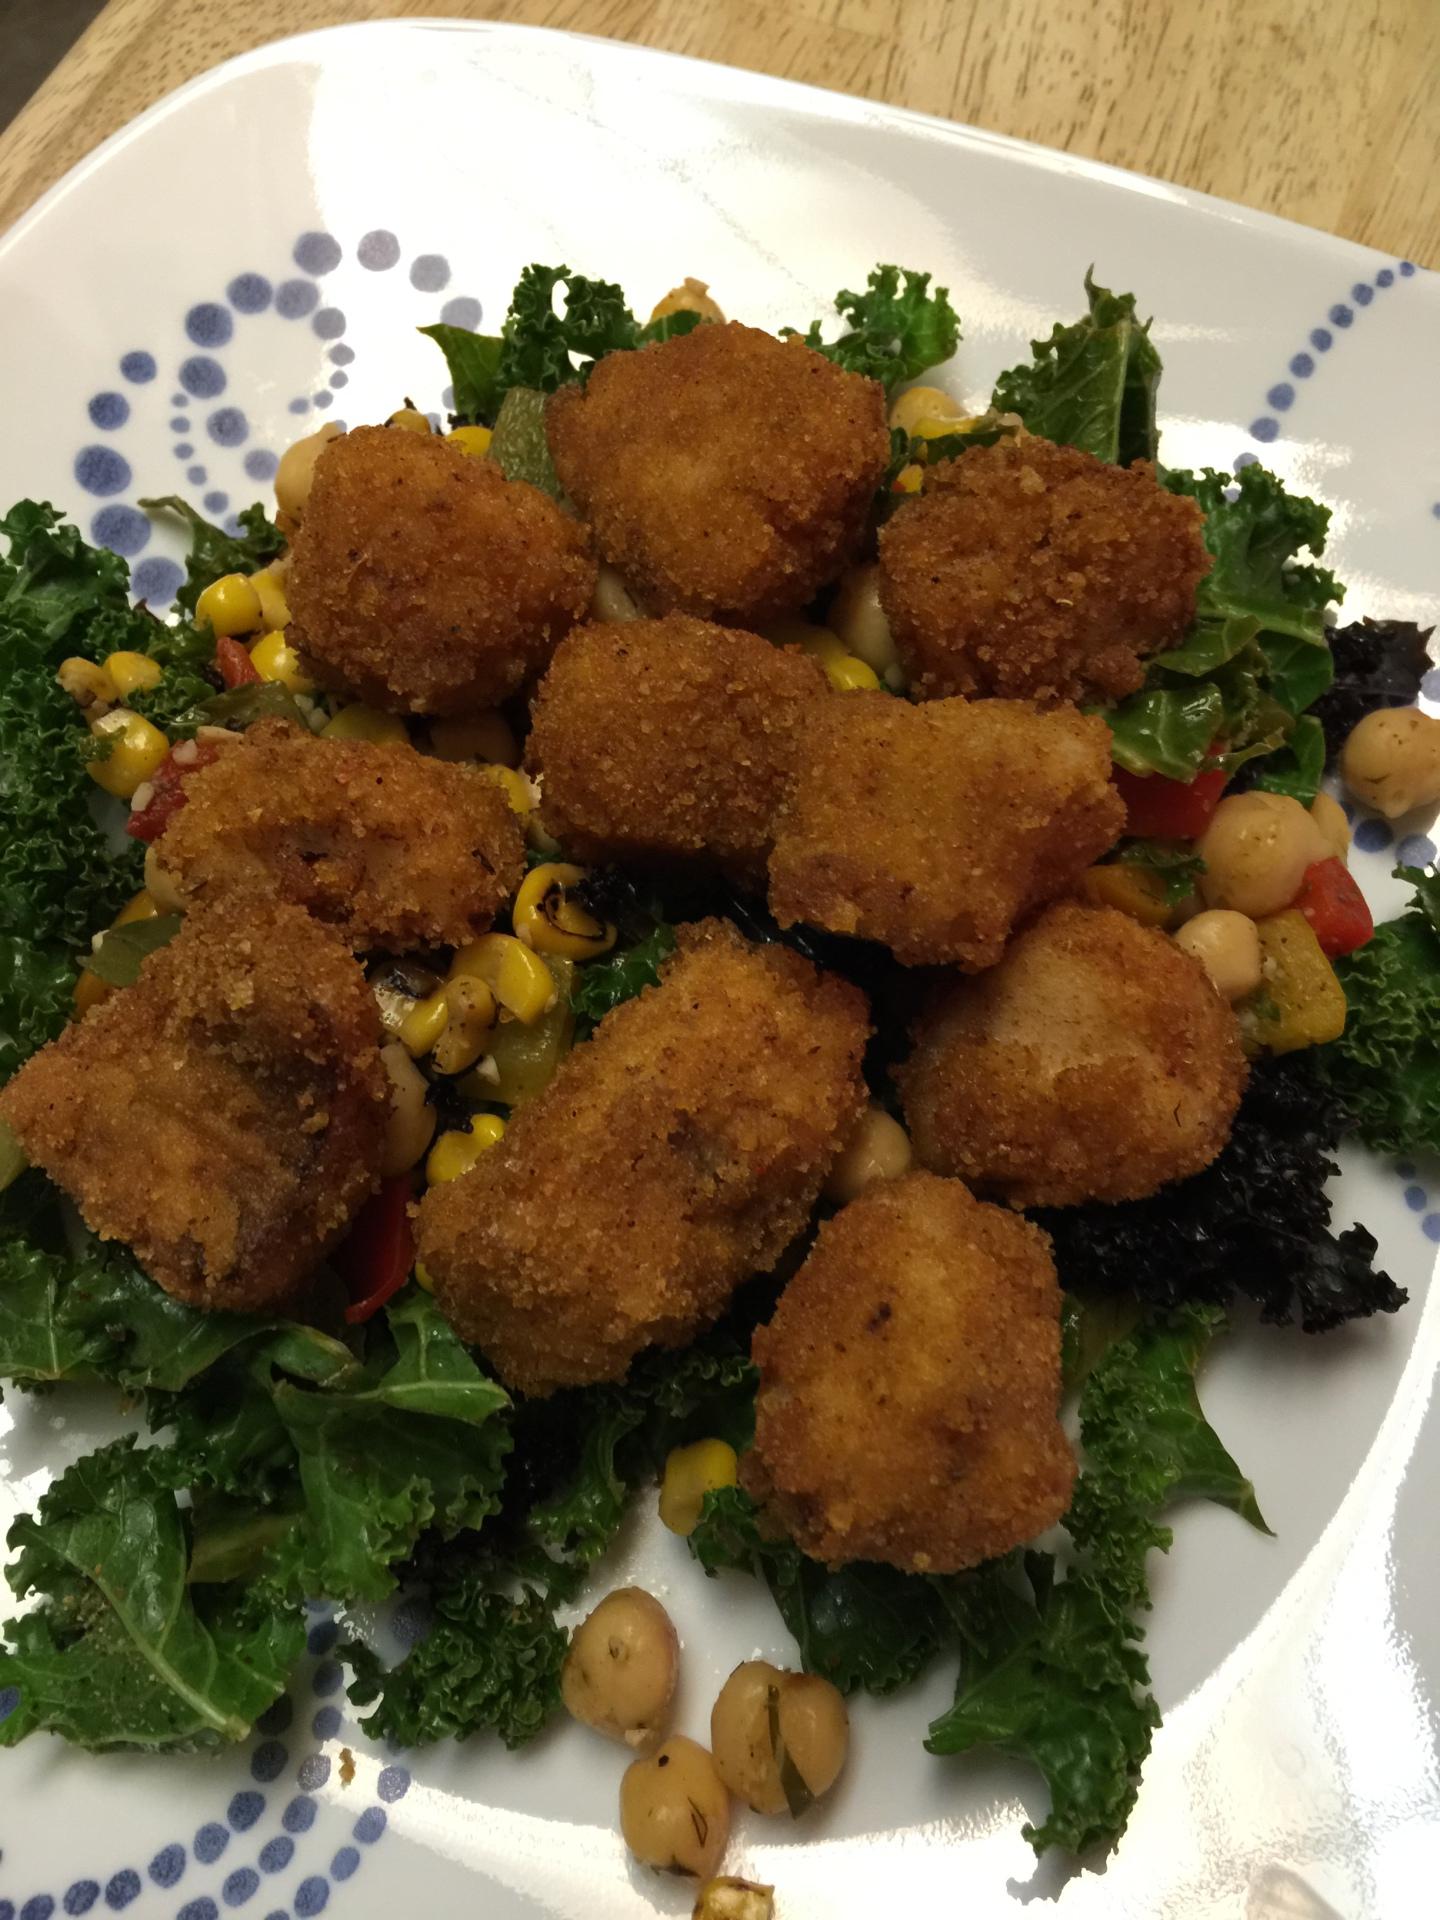 Rockfish and a warm Kale Salad